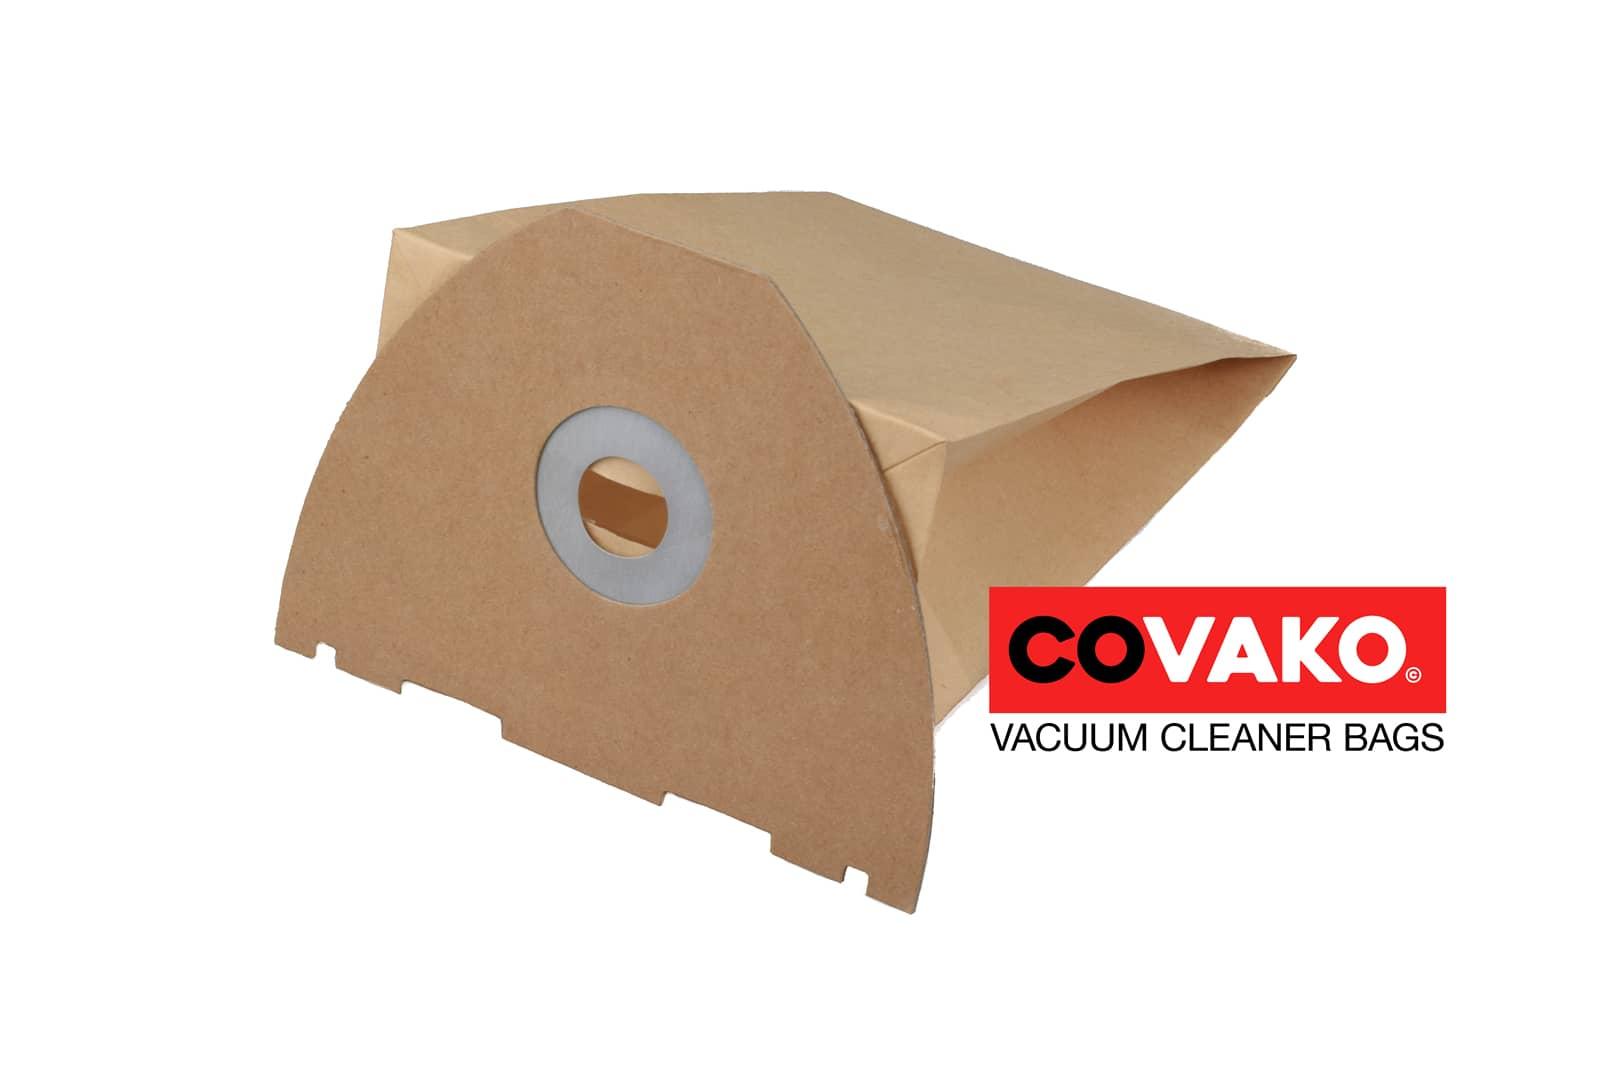 Electrolux UZ 964 / Paper - Electrolux vacuum cleaner bags